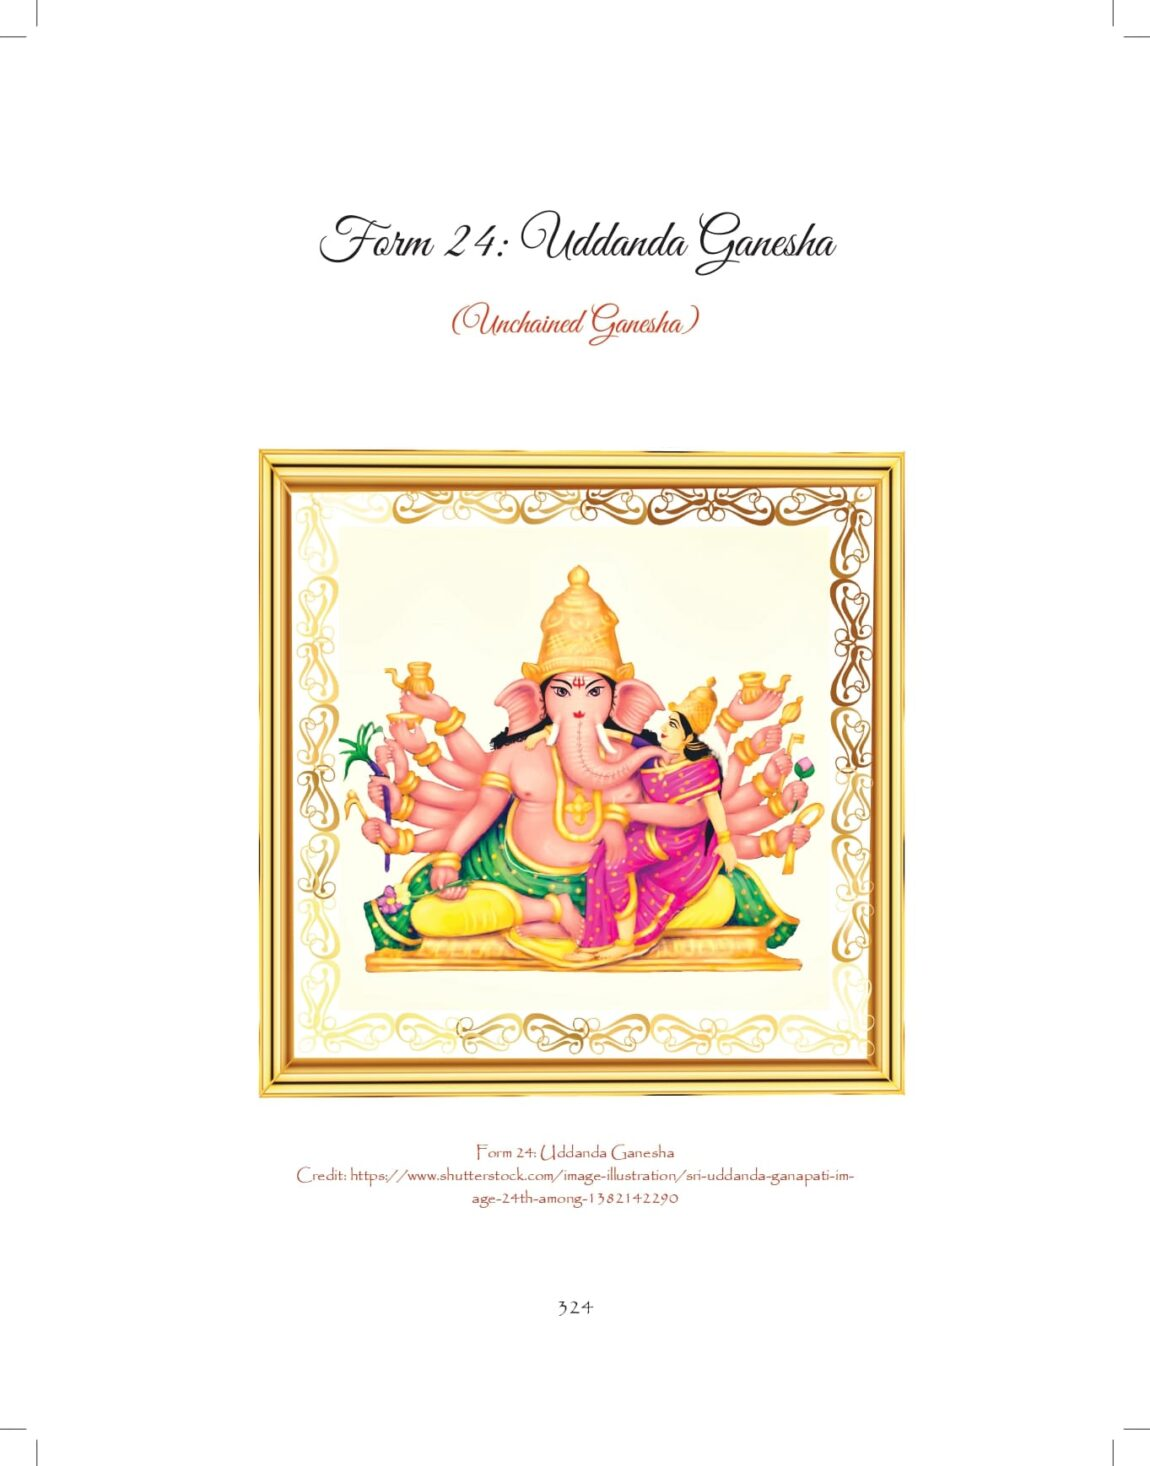 Ganesh-print_pages-to-jpg-0324.jpg